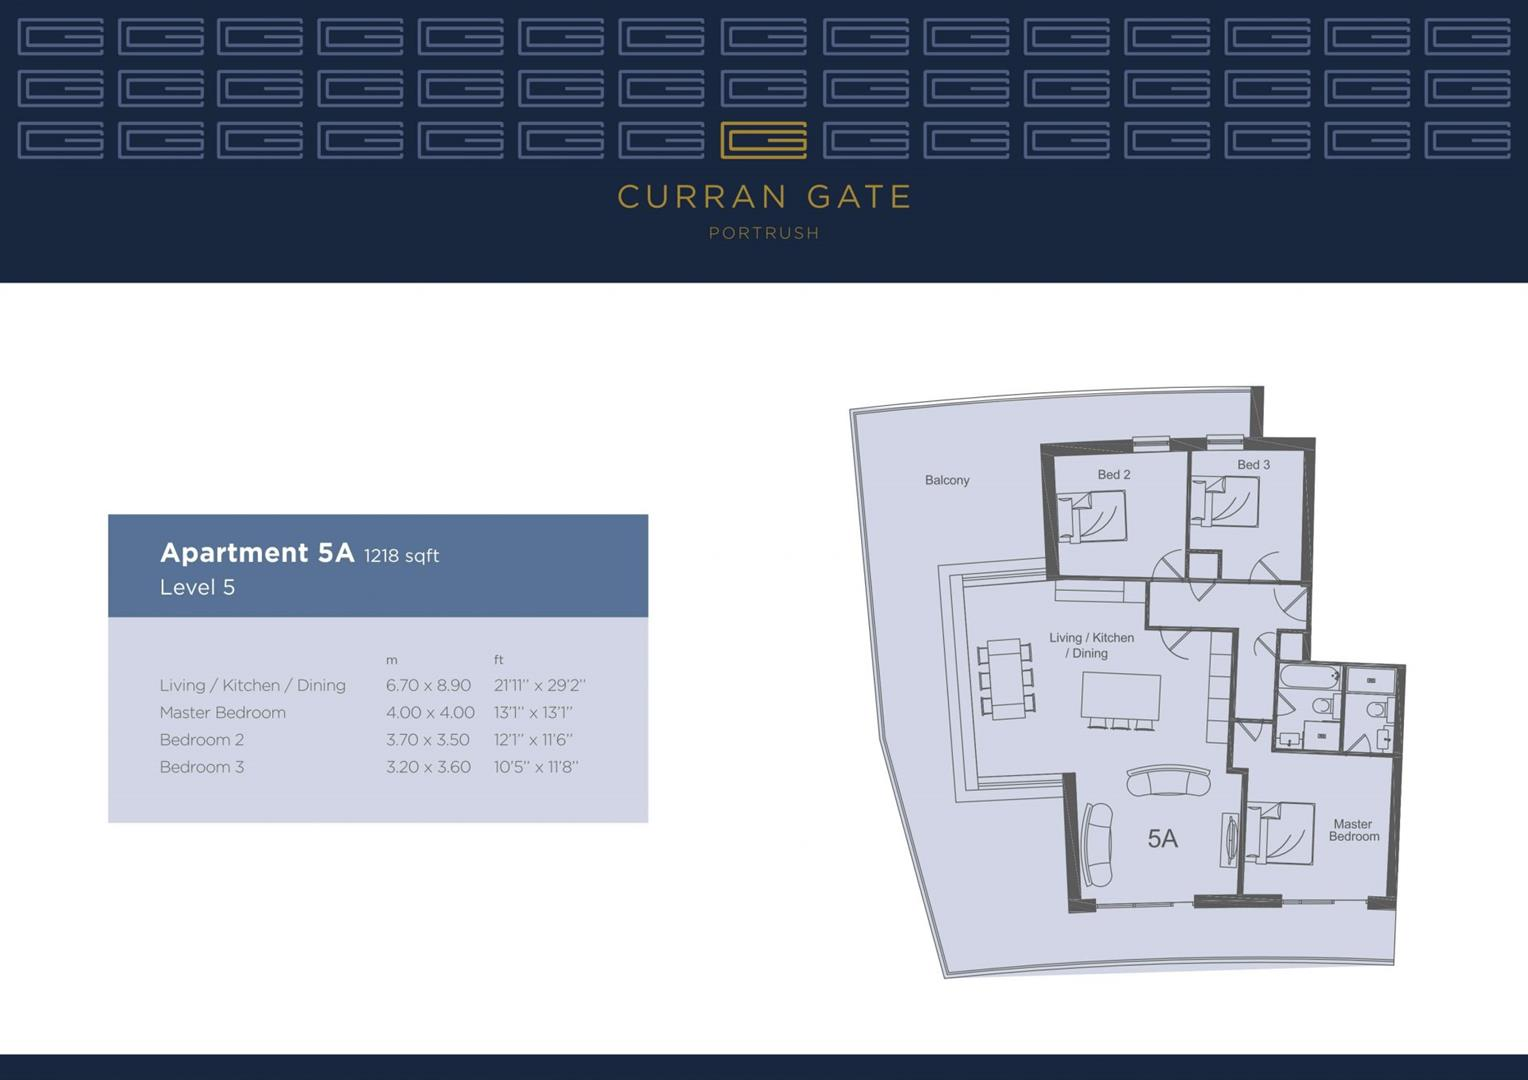 5a-curran-gate-portrush-homepage-estate-agents.jpg